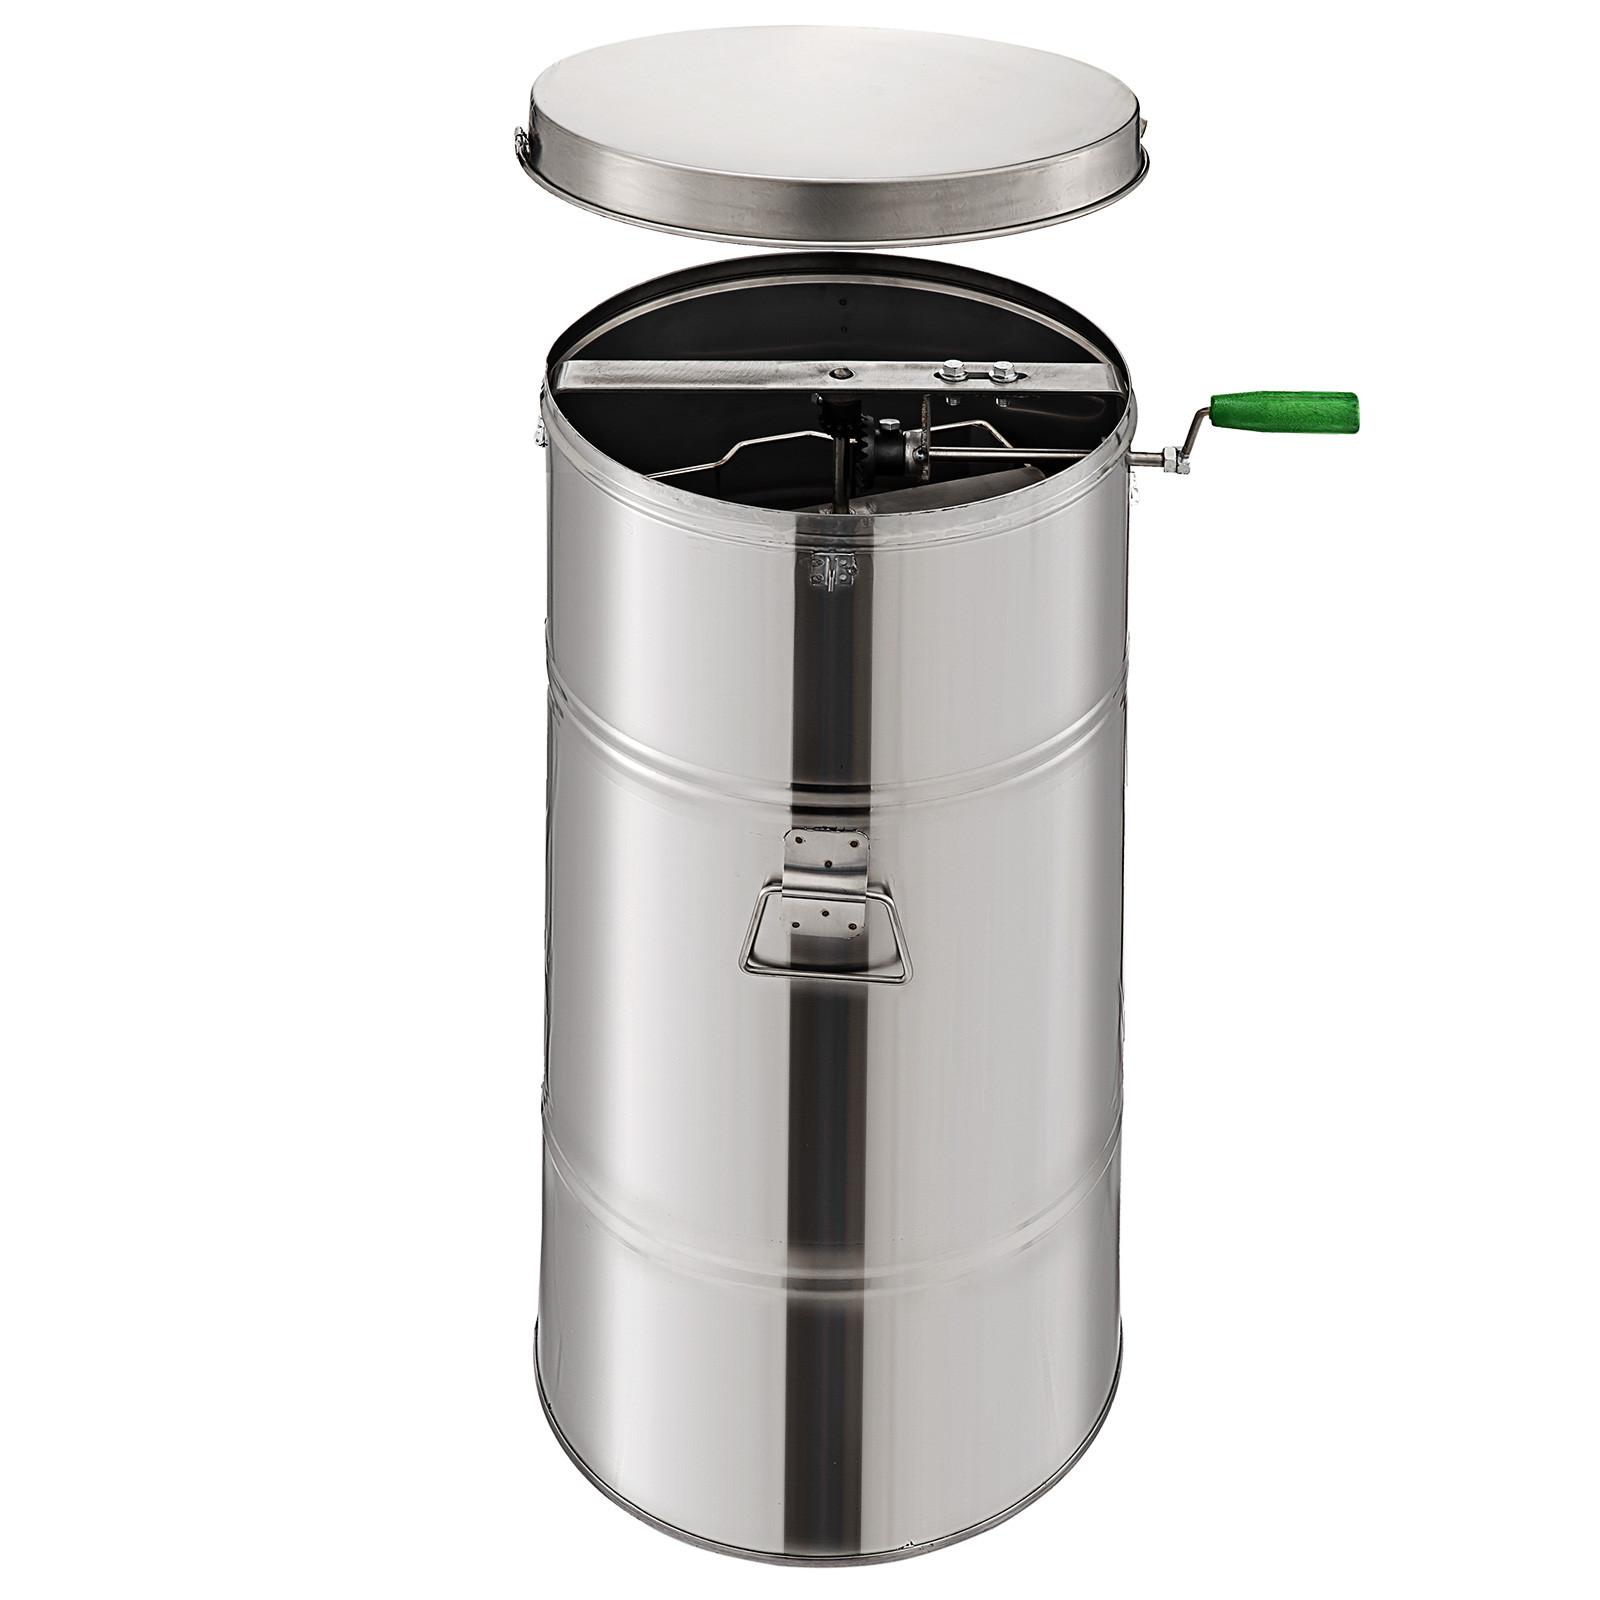 Extracteur-de-Miel-Electrique-manuelle-2-3-4-Cadres-En-Acier-Inox-Centrifugeuse miniature 17